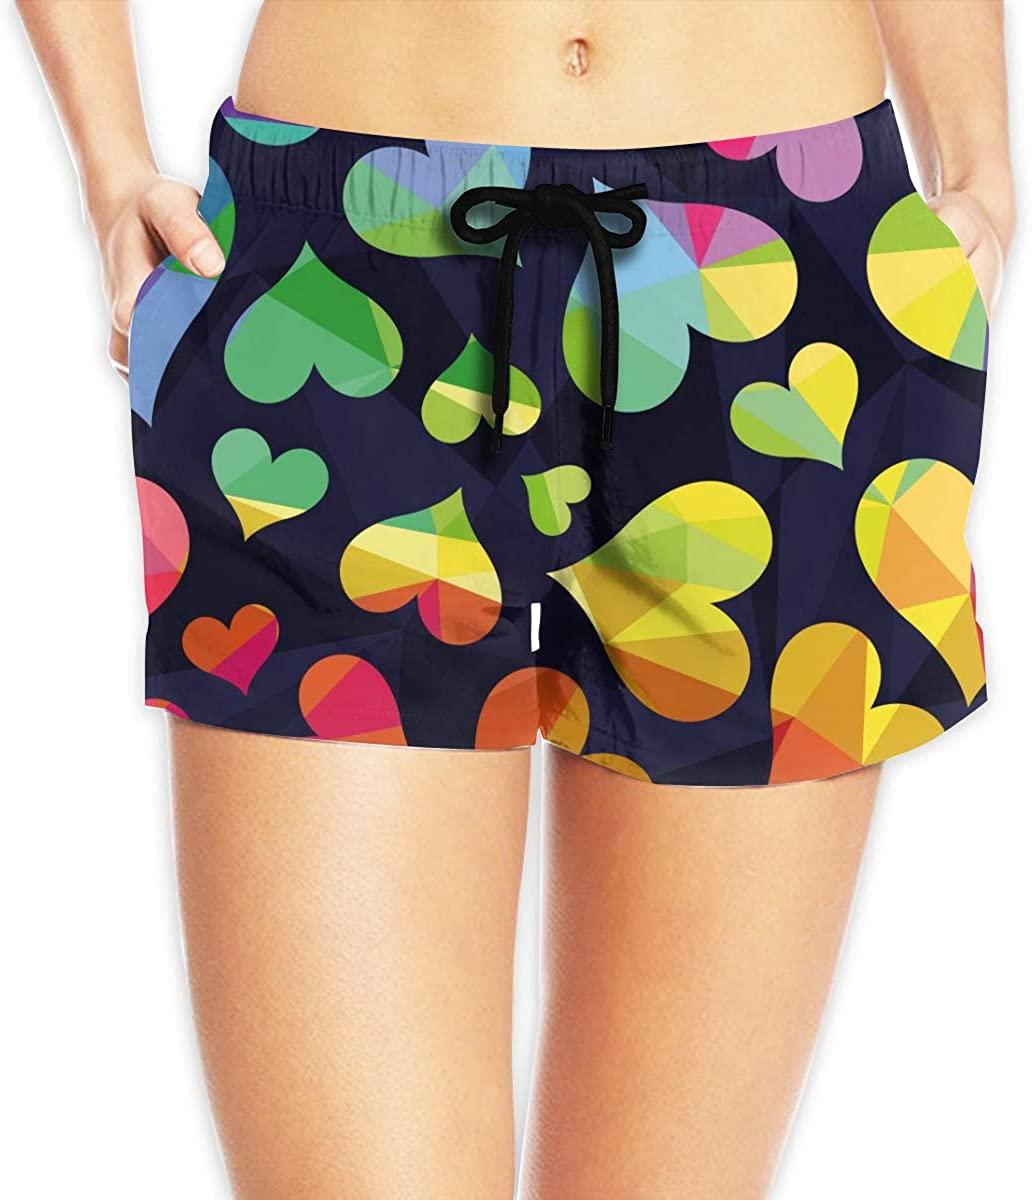 Polygonal Rainbow Heart Women's Beach Shorts Board Shorts with Pocket Swimming Trunks